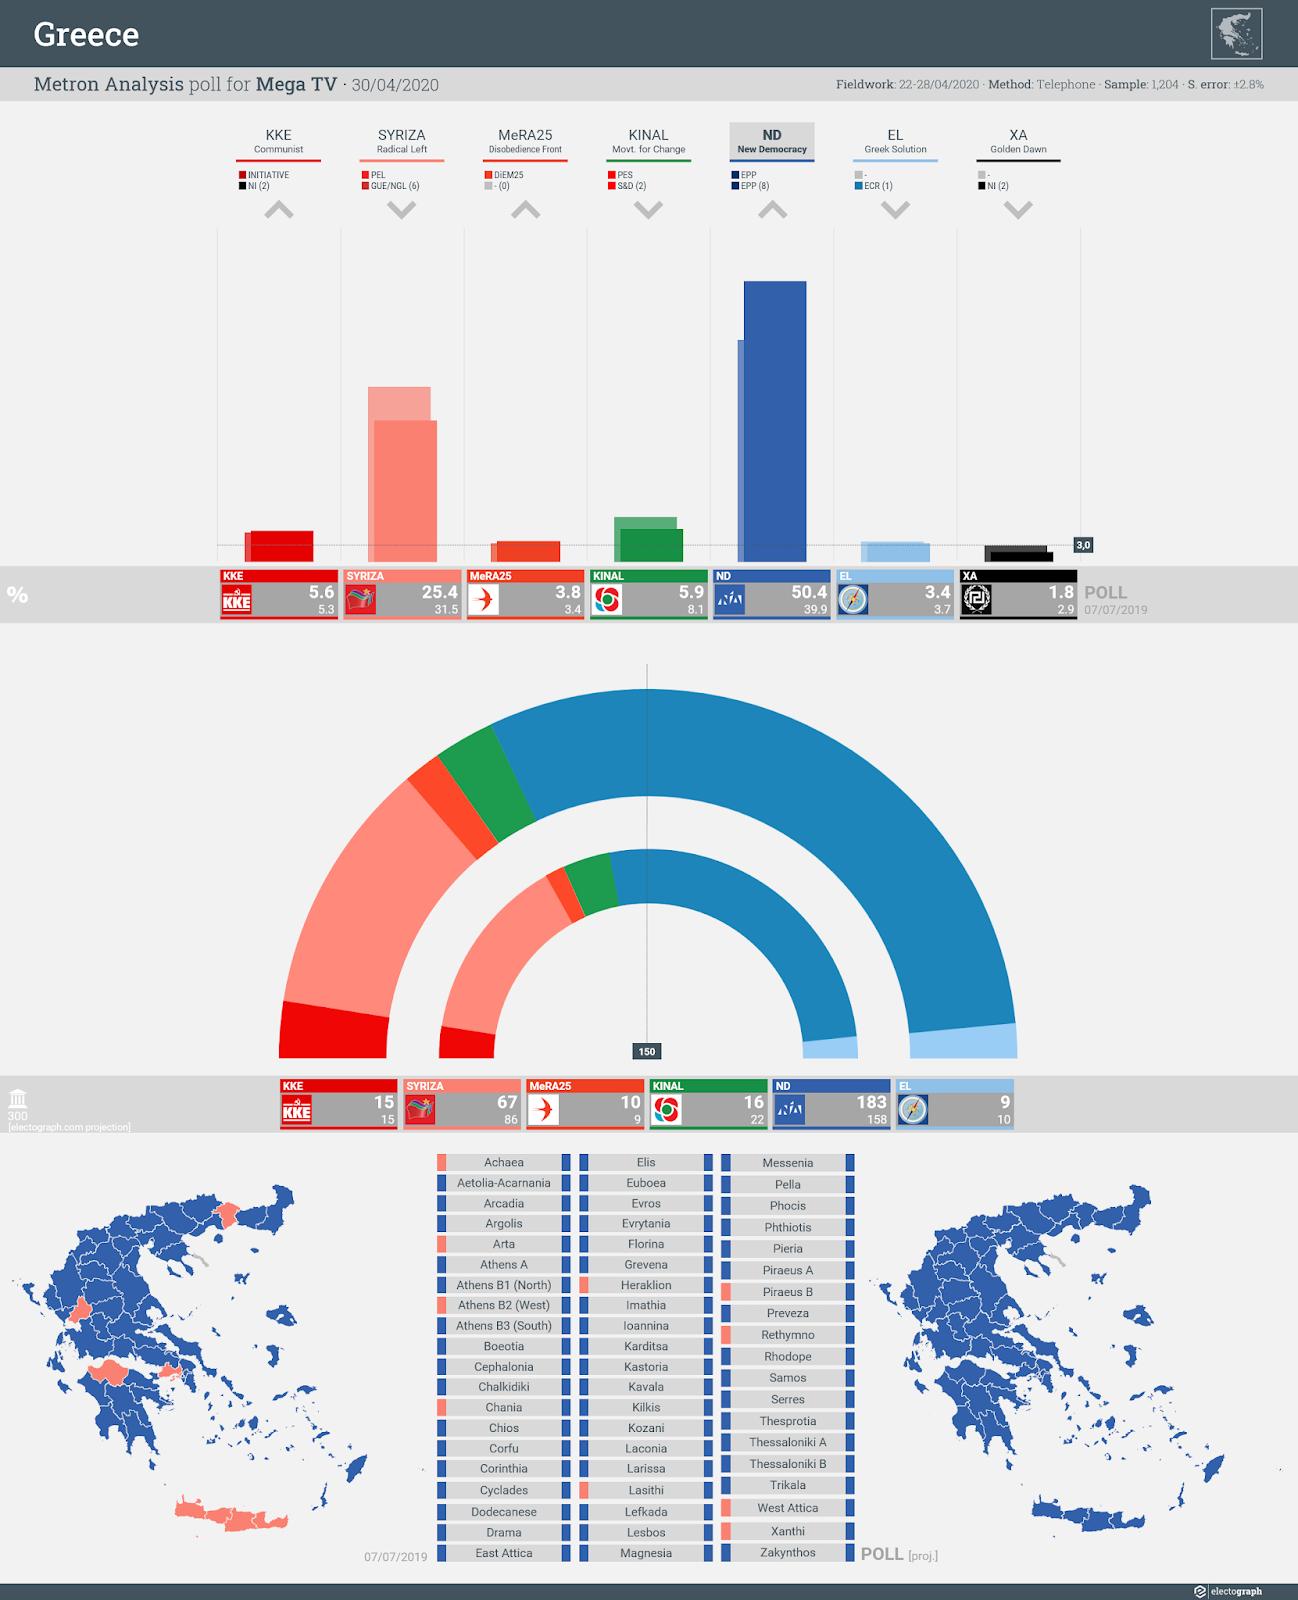 GREECE: Metron Analysis poll chart for Mega TV, 30 April 2020